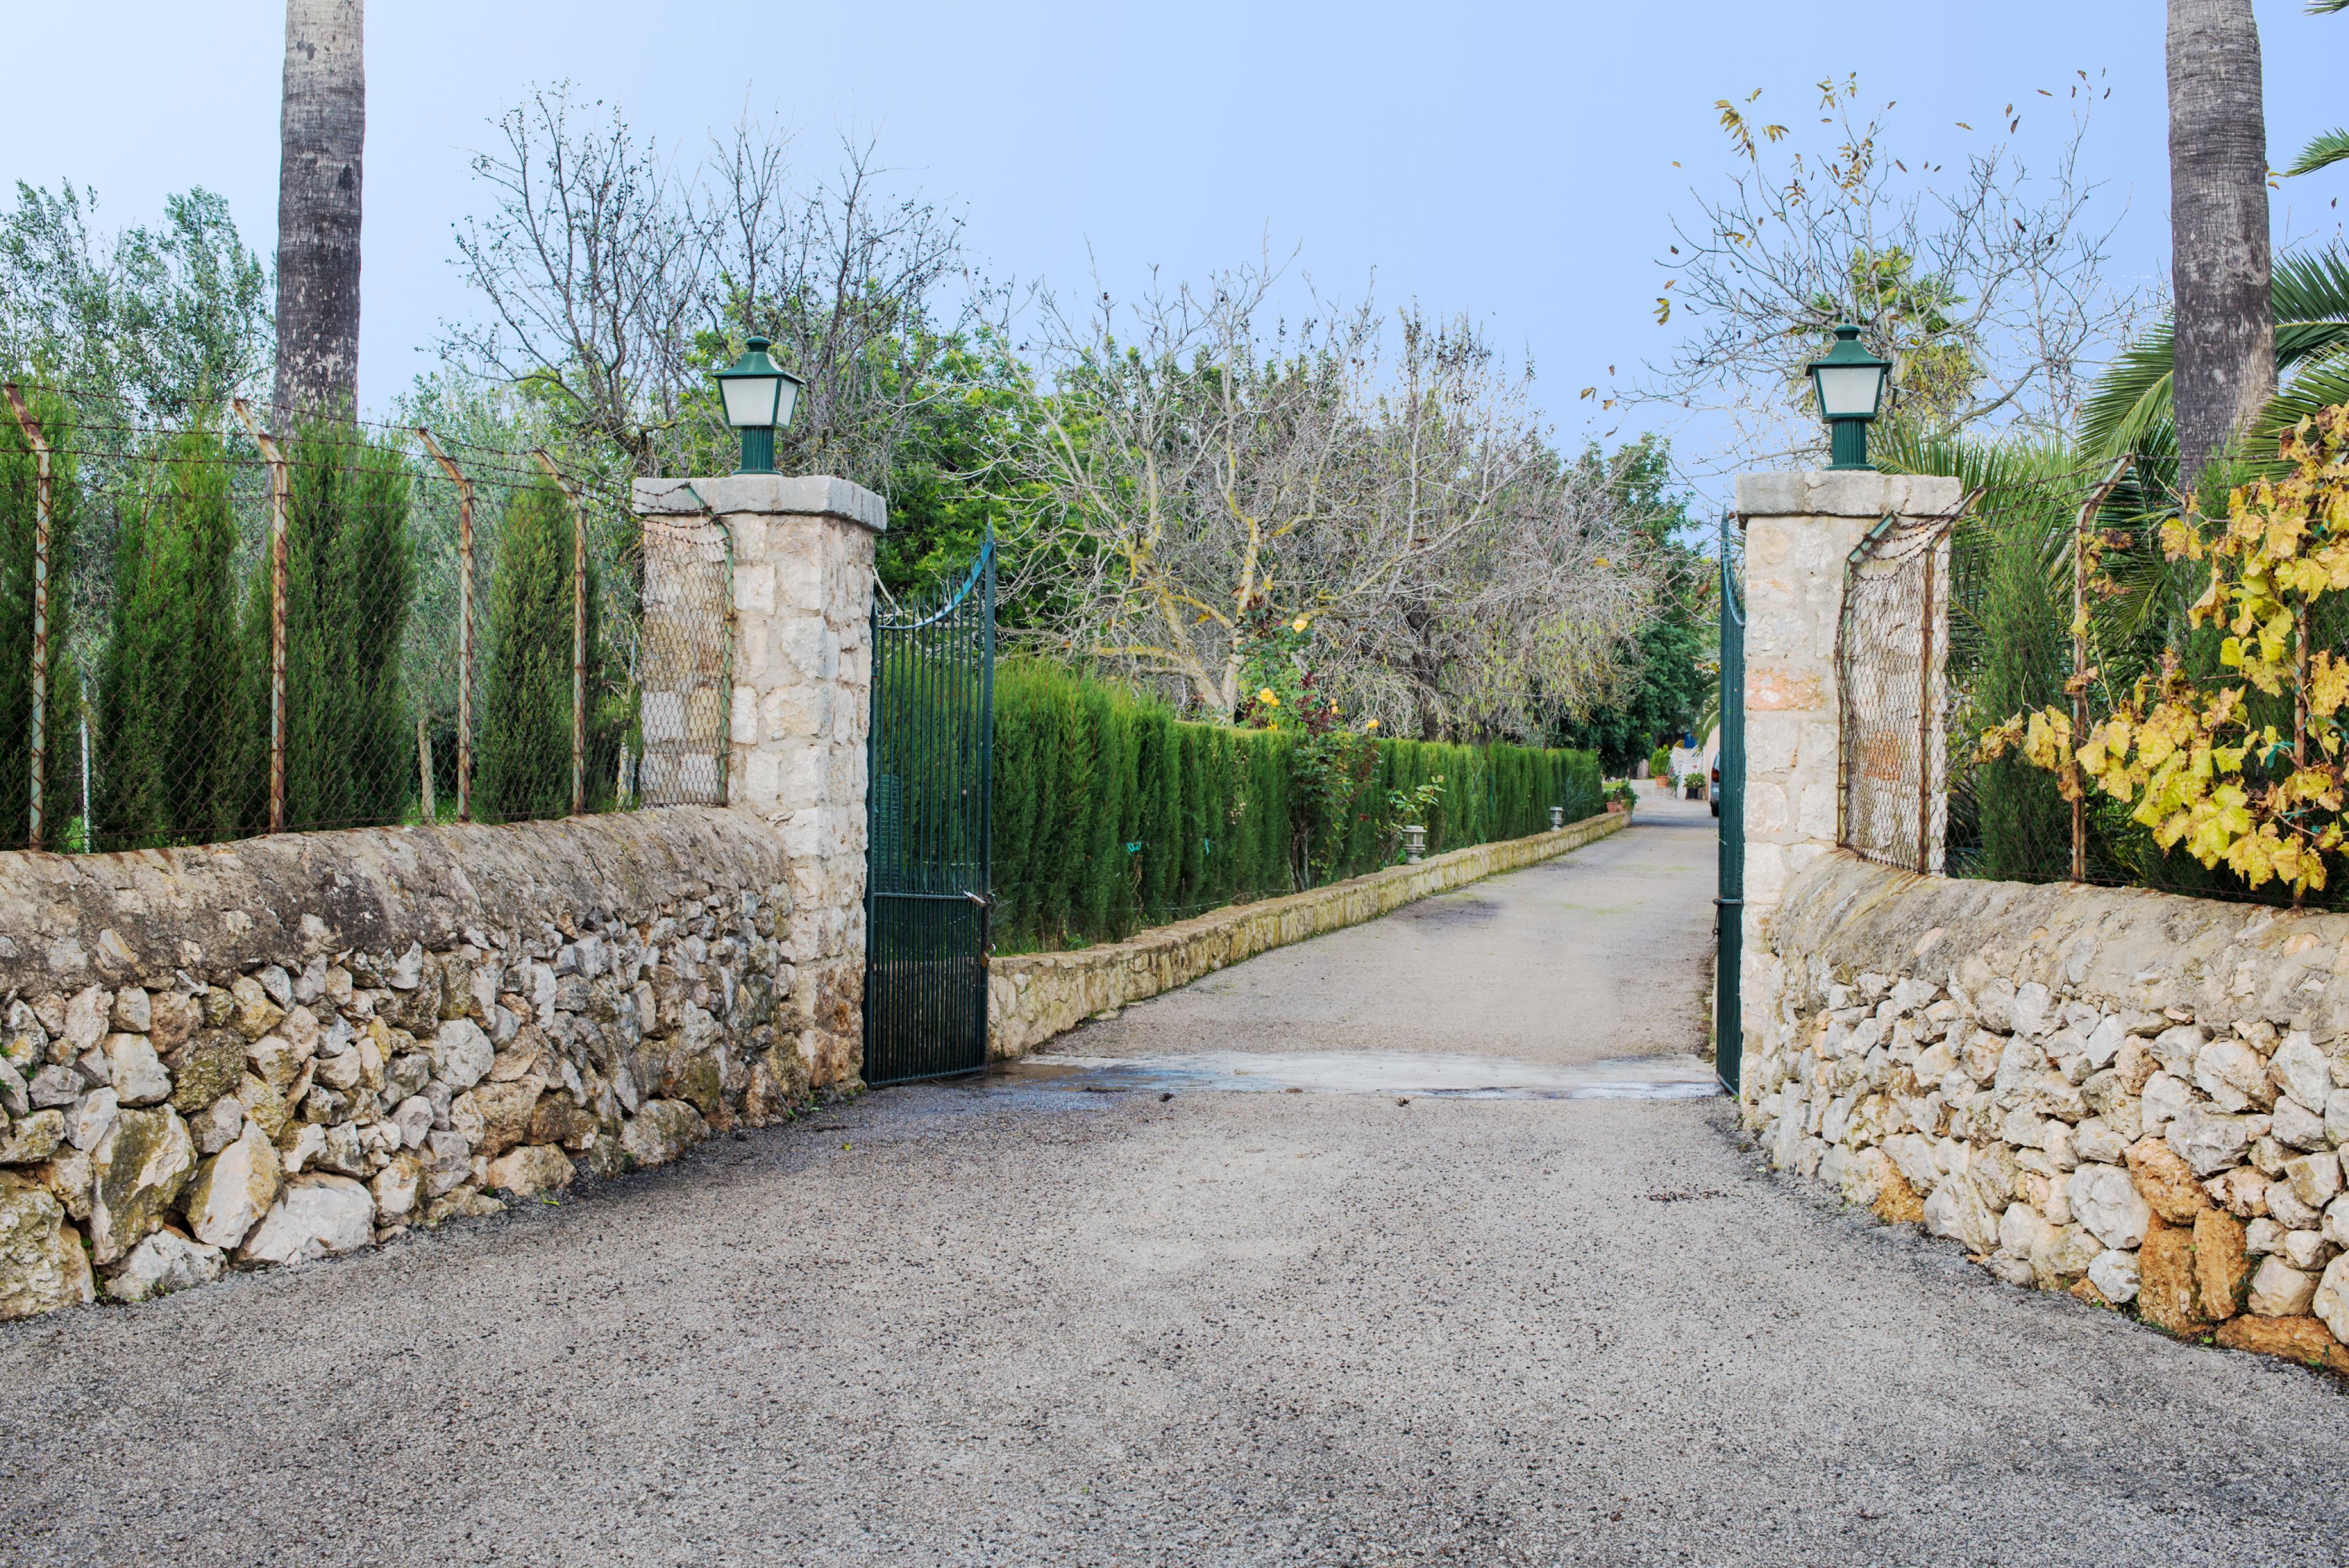 Maison de vacances CA'N LLUC- Alaró- MALLORCA - Kostenloses WLAN (2687507), Alaro, Majorque, Iles Baléares, Espagne, image 42